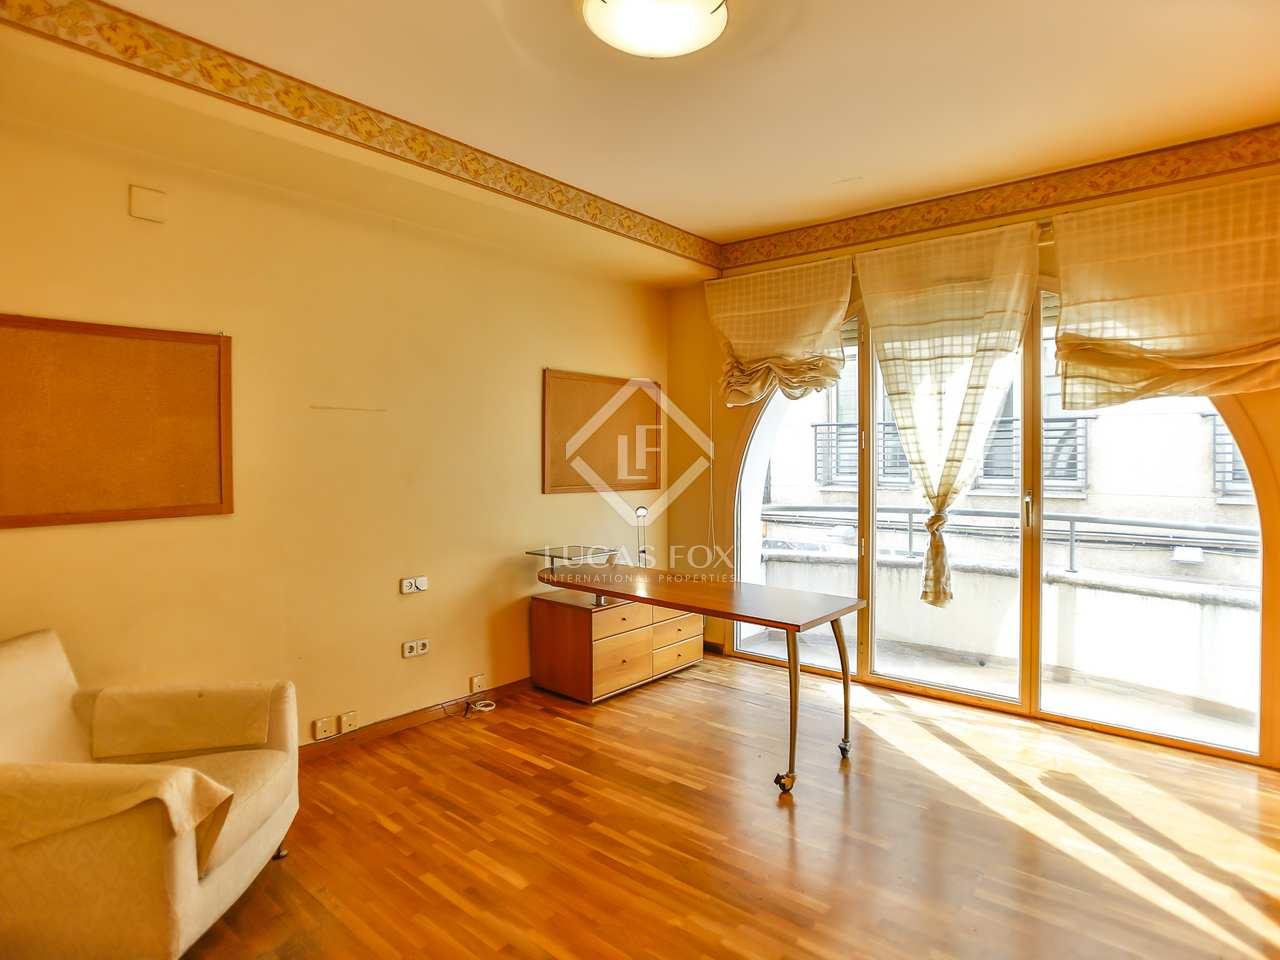 Piso de 160m con terraza en venta en vilanova i la geltr - Compartir piso vilanova i la geltru ...